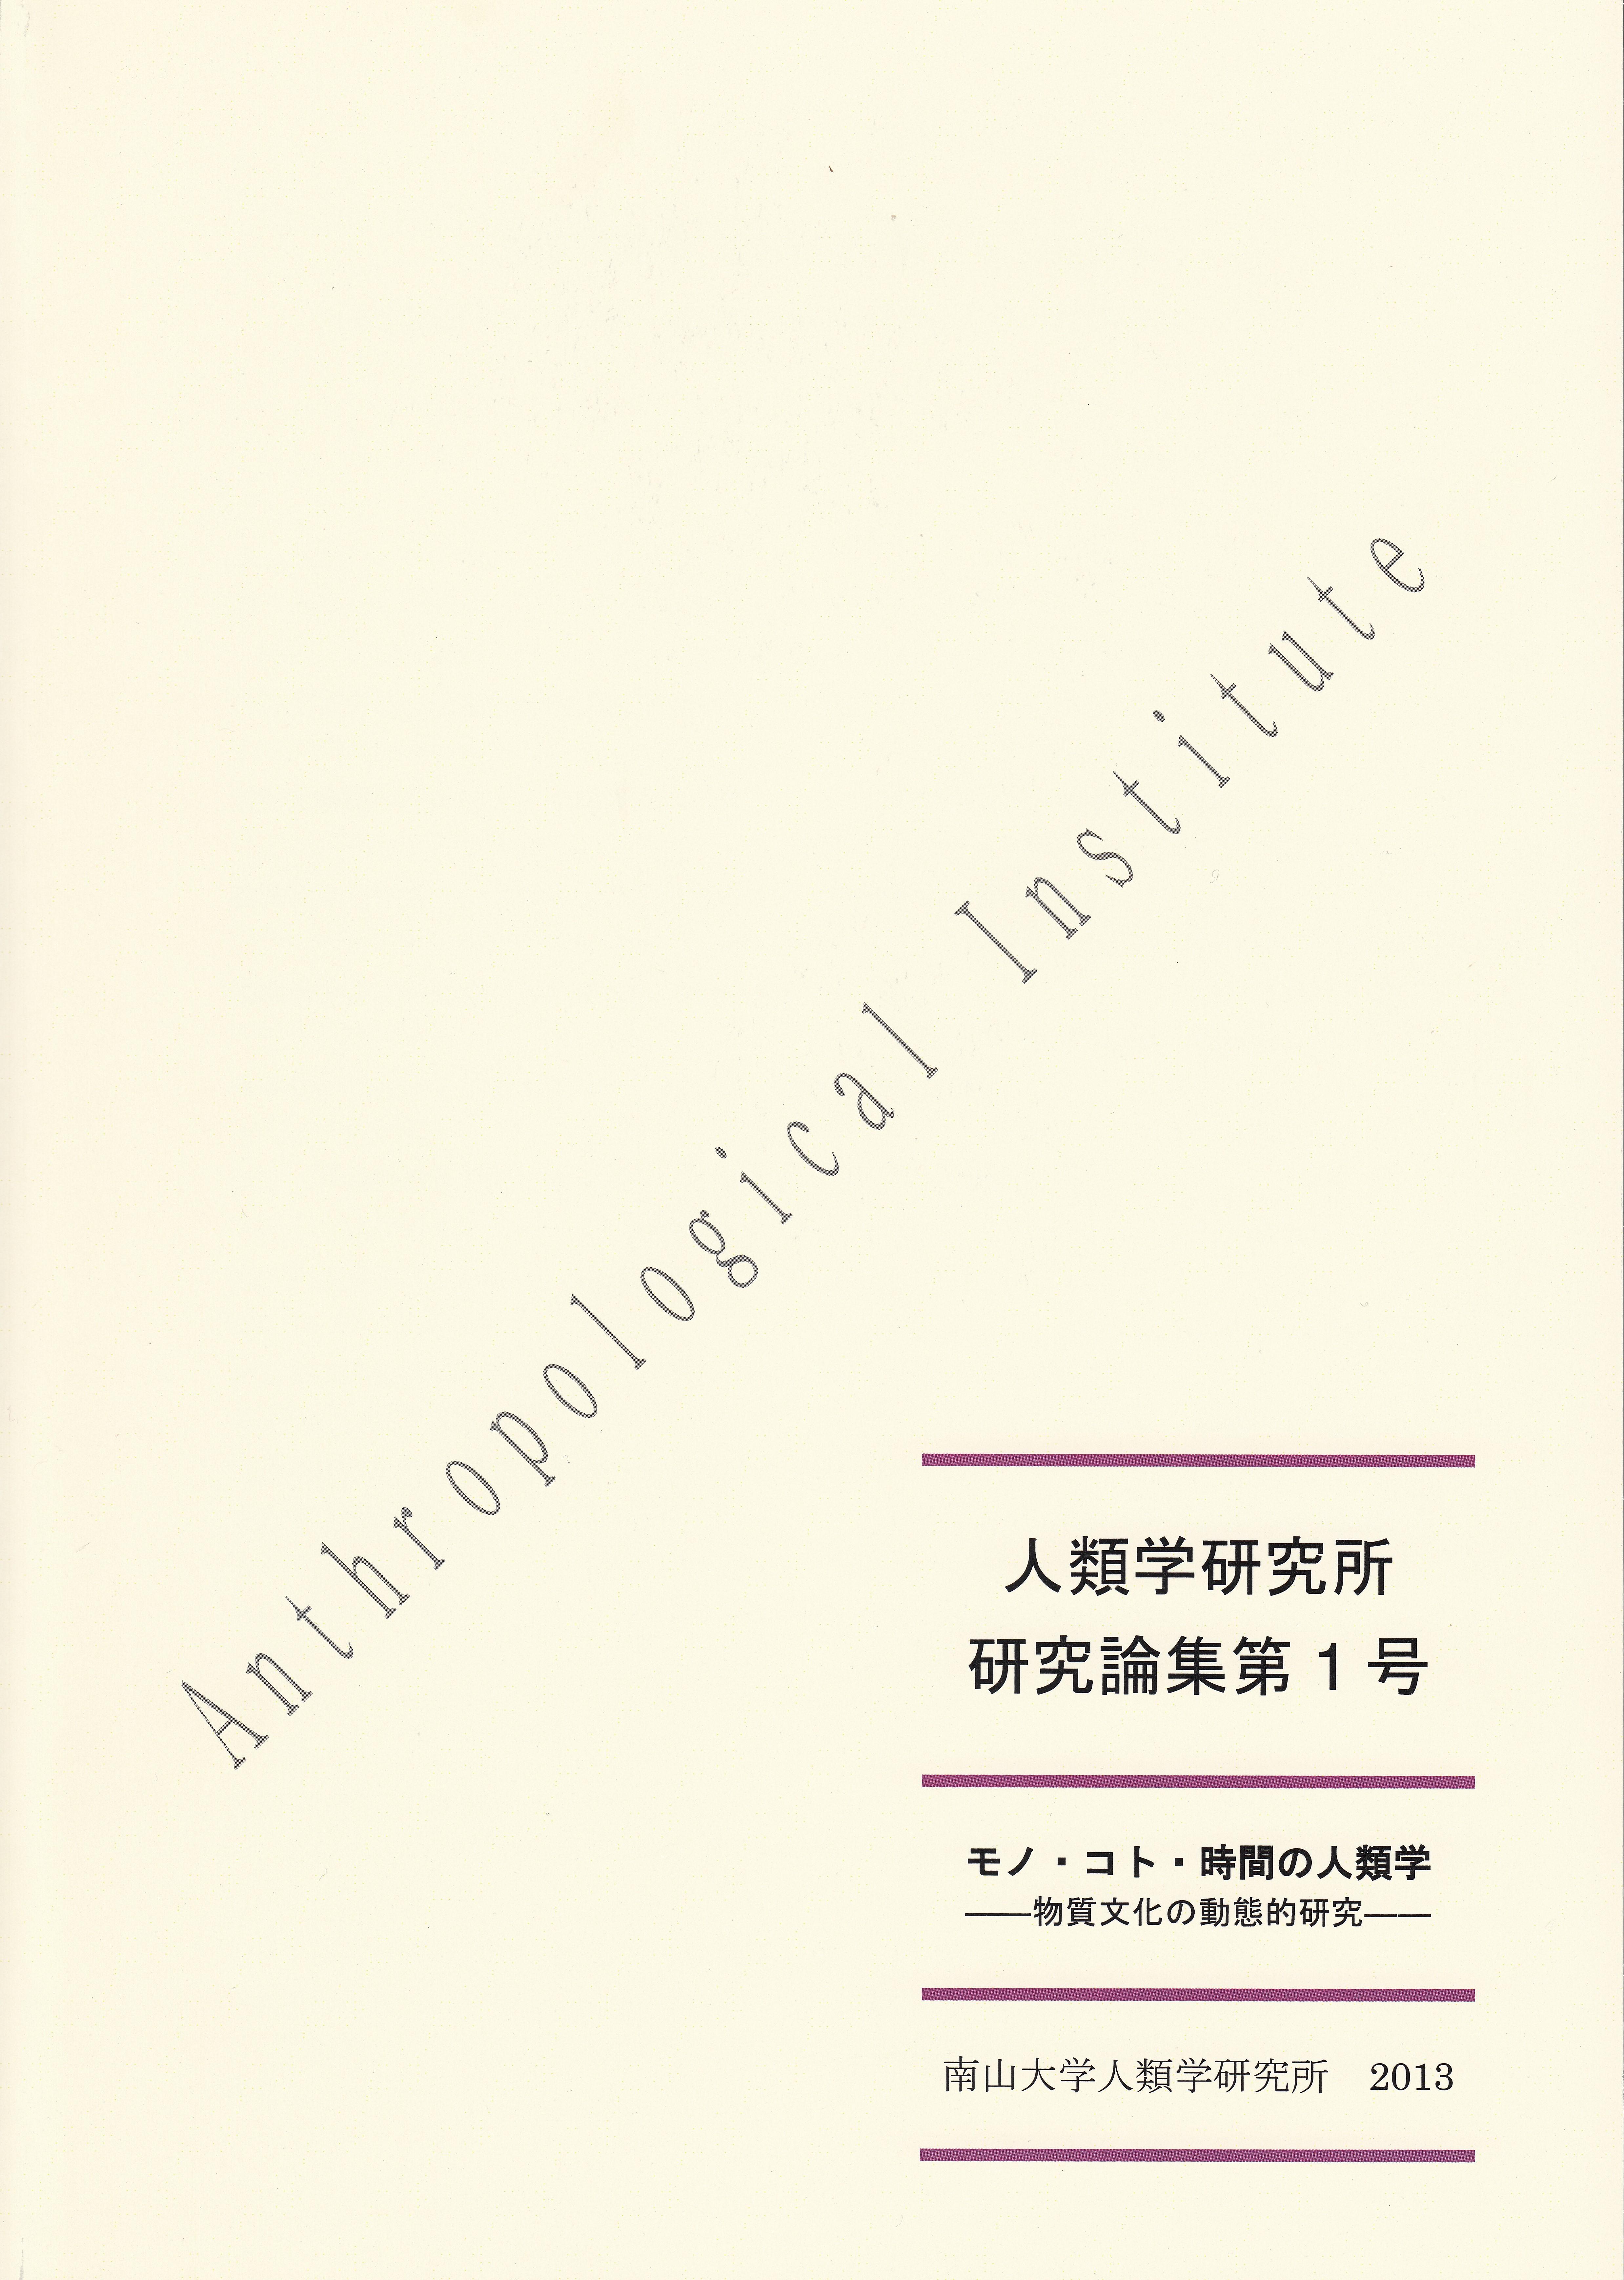 『人類学研究所 研究論集』第1号 2013年(モノ・コト・時間の人類学―物質文化の動態的研究―)